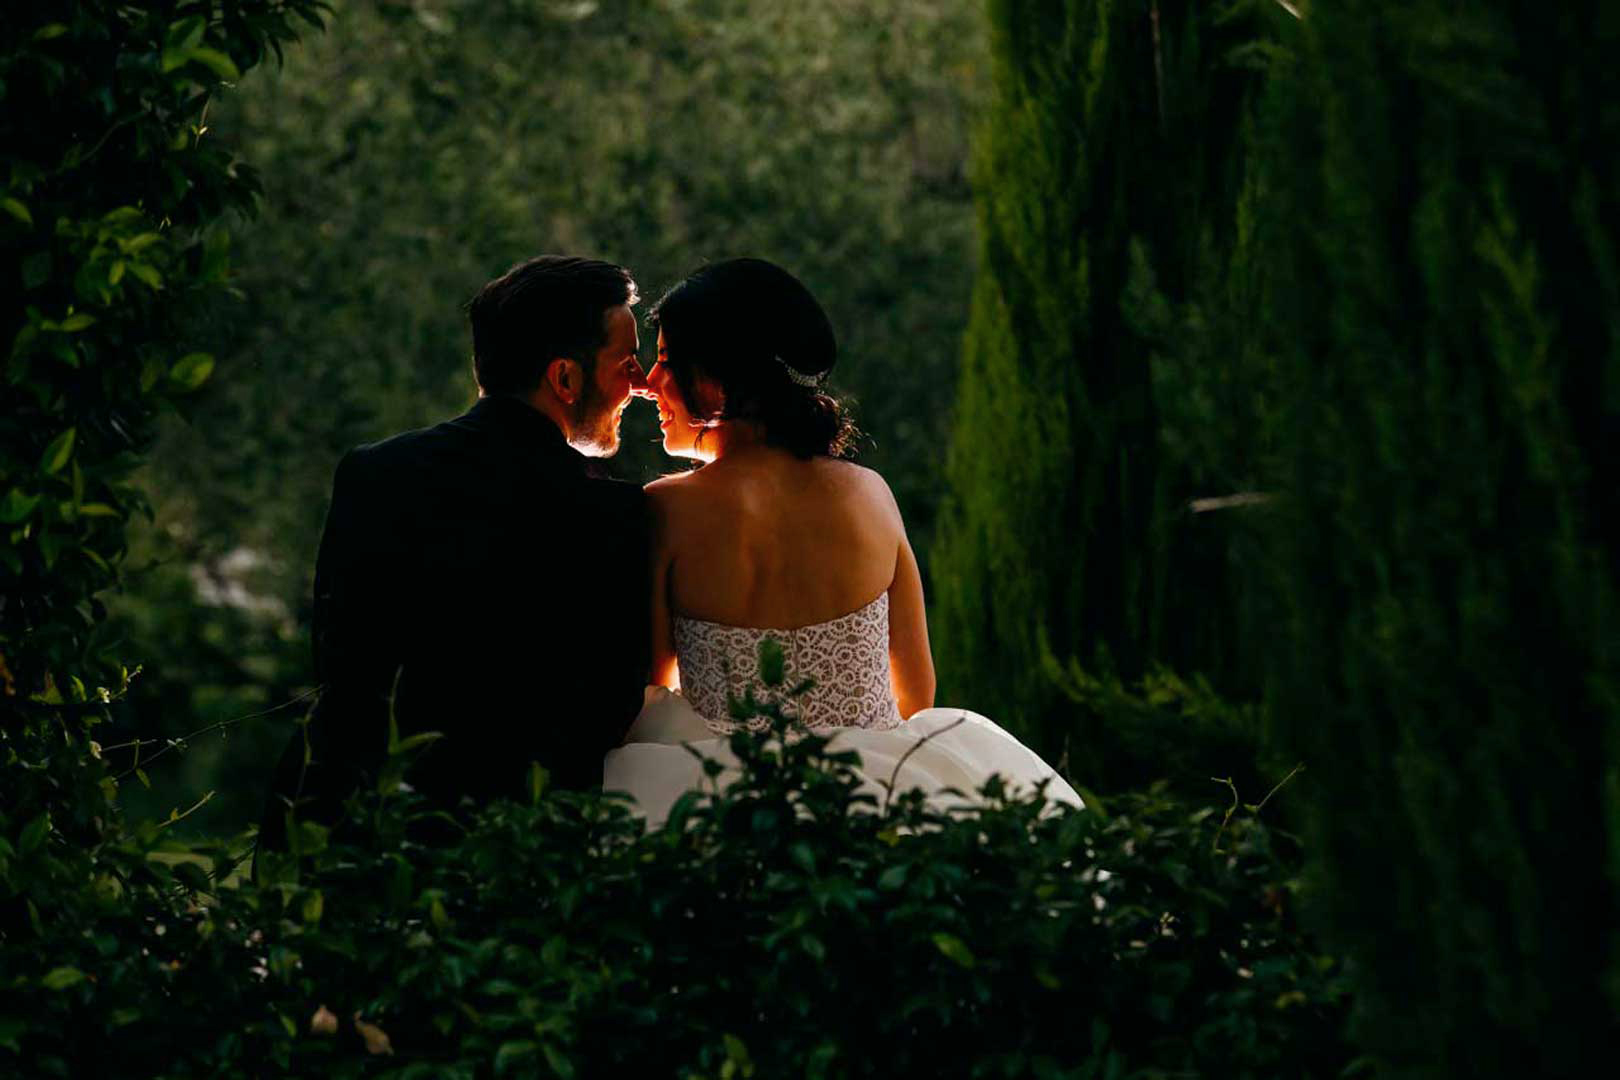 039-controluce-matrimonio-gianni-lepore-fotografo